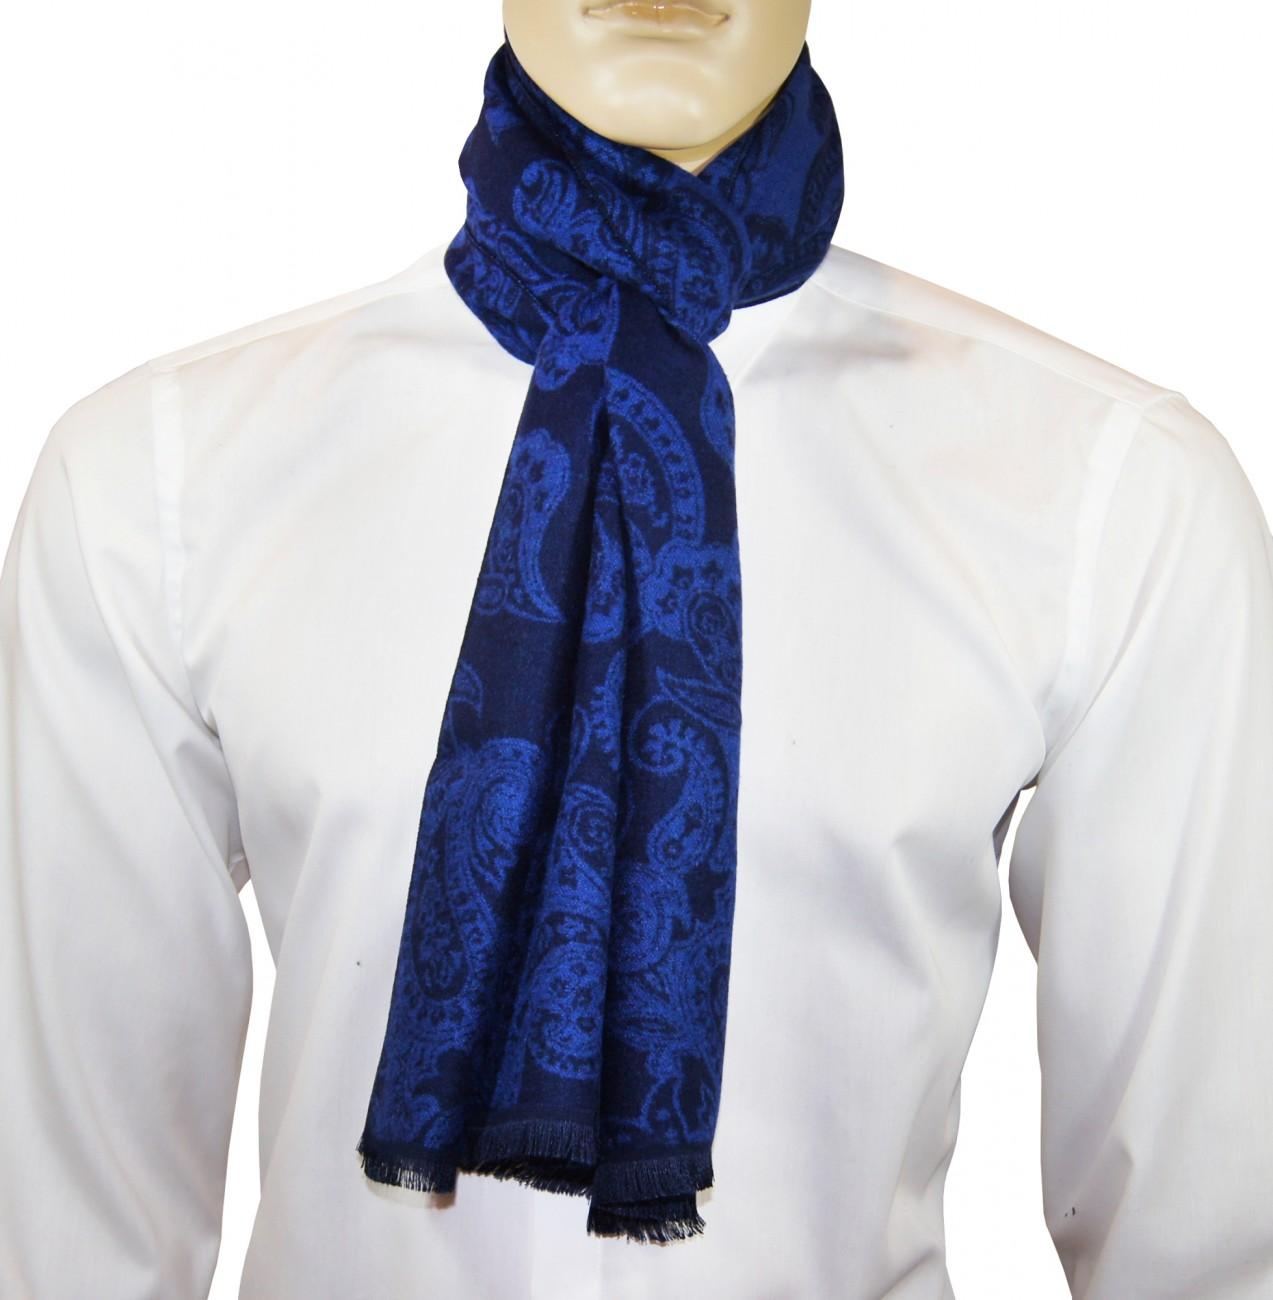 Herren schal schwarz blau paisley warm hs48 paul malone shop - Herren schal binden ...